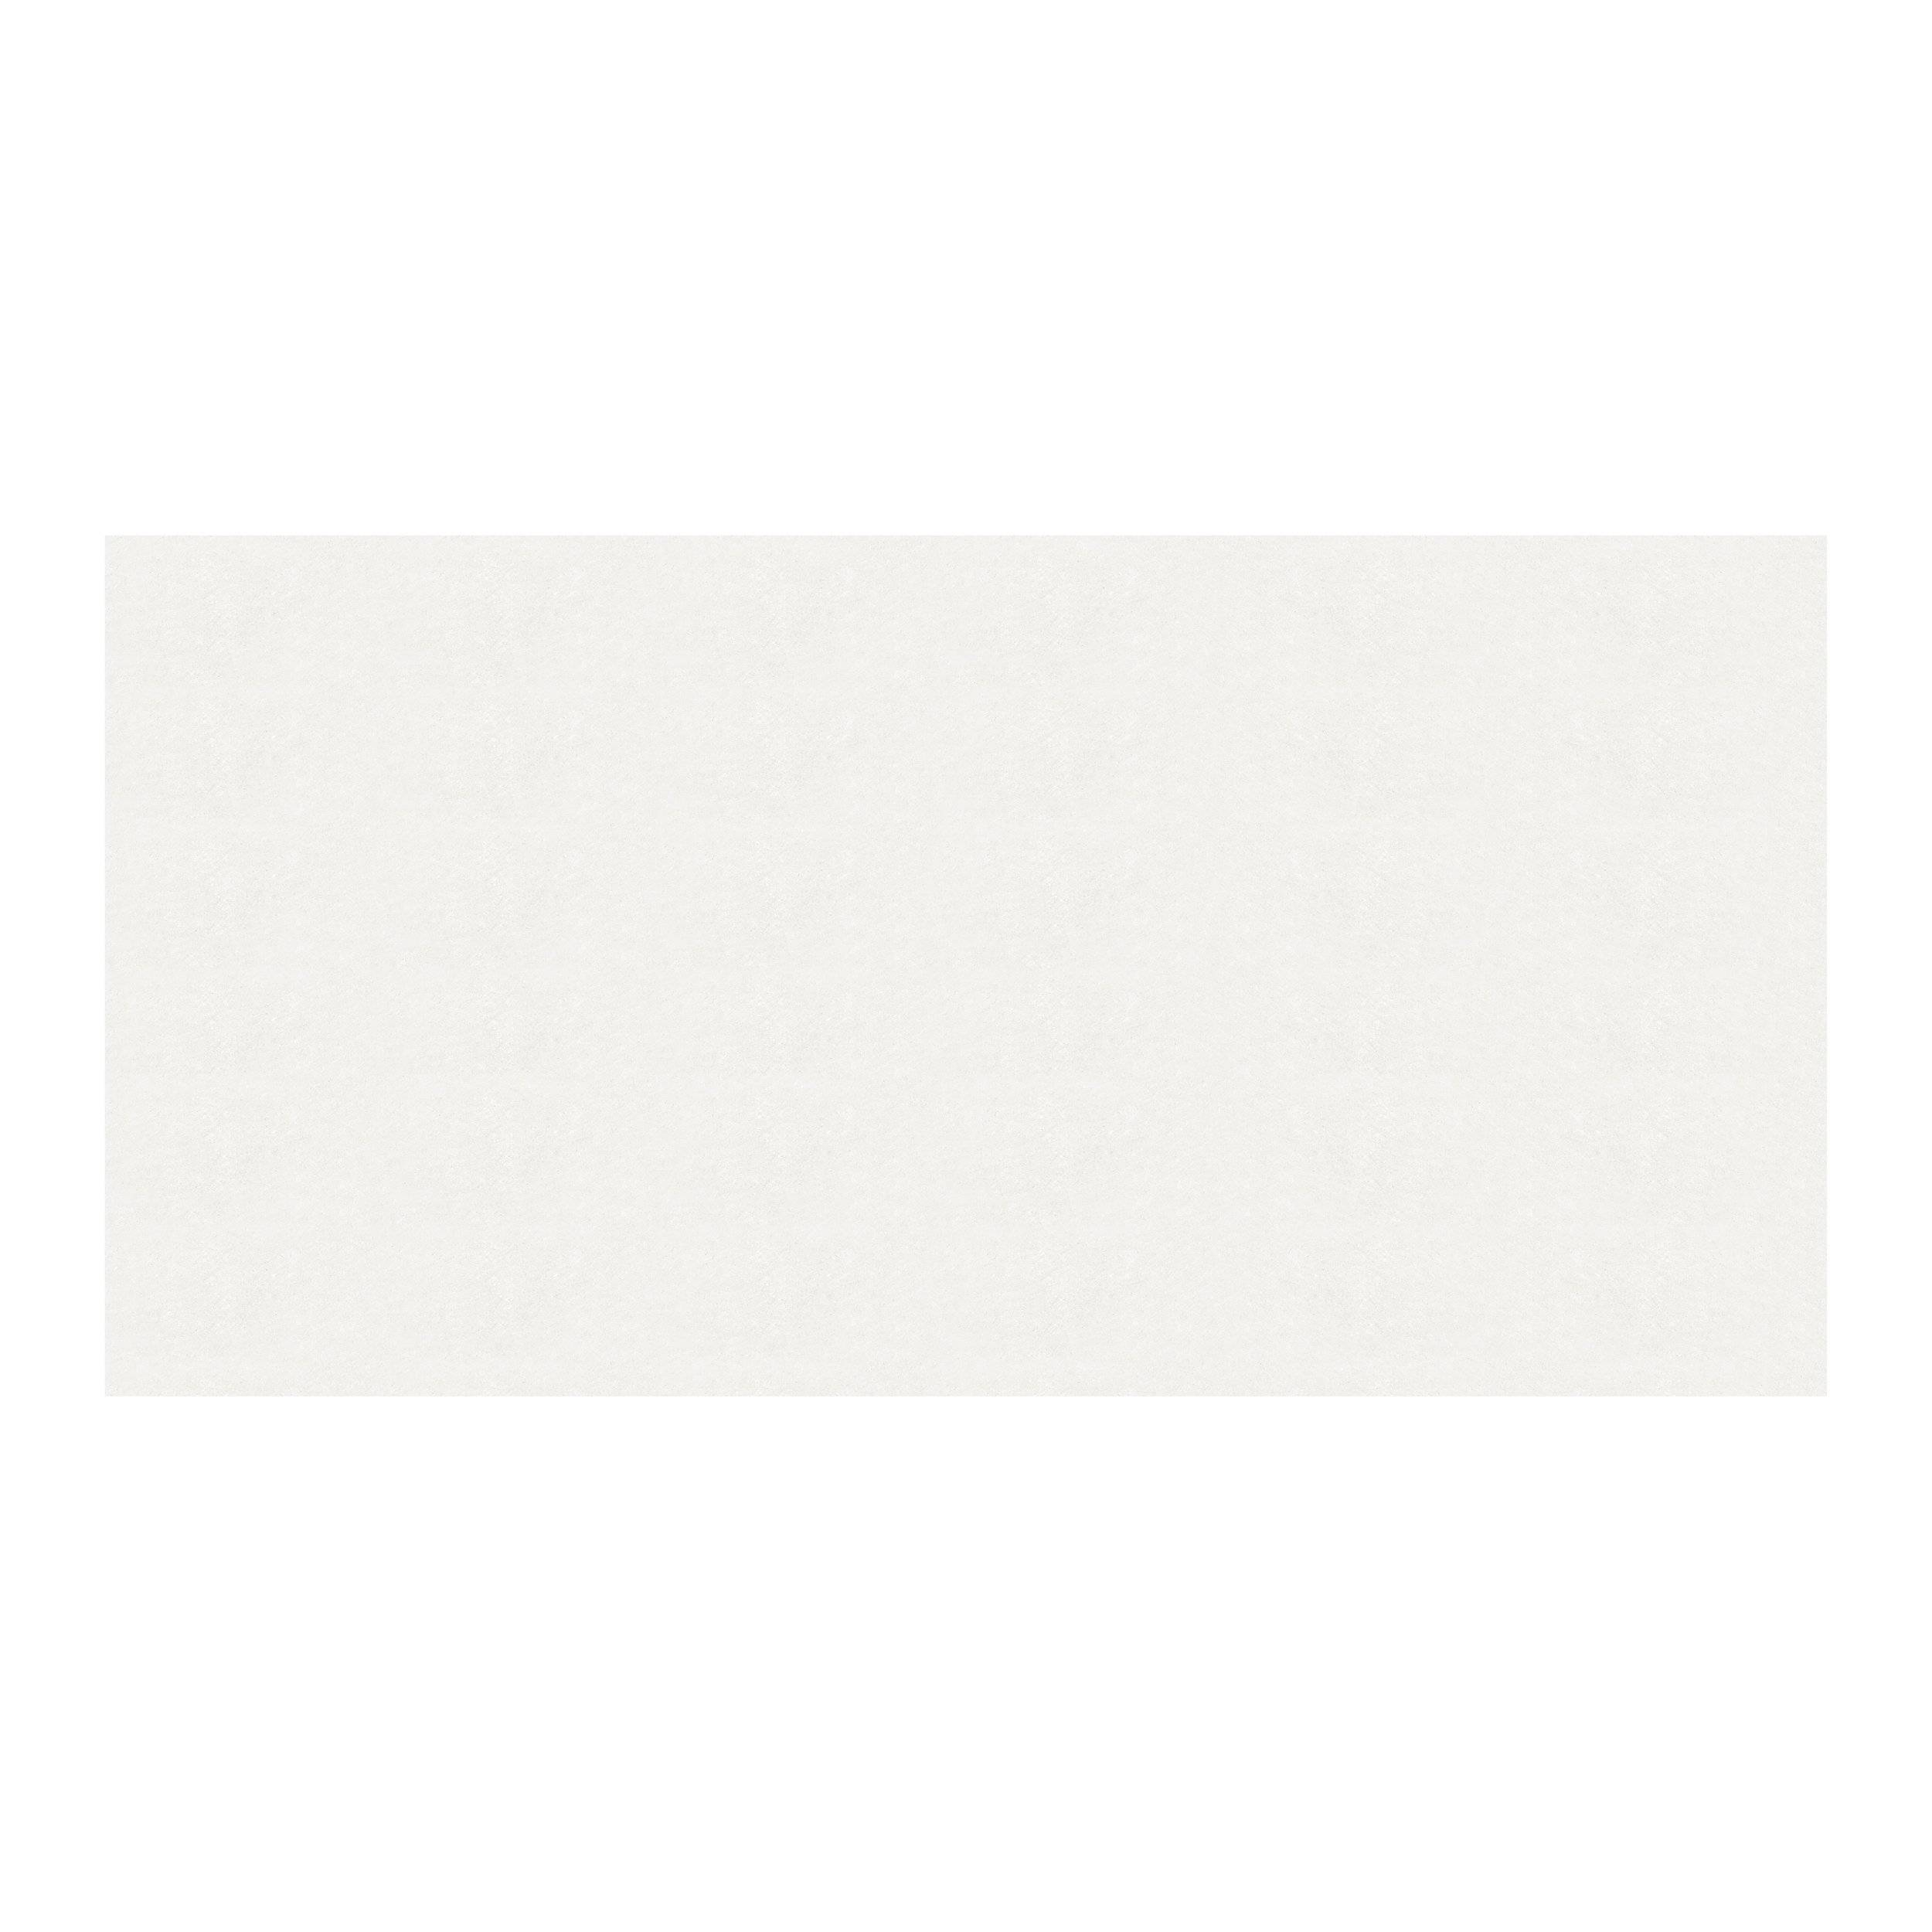 Blanco Polished Porcelain Tile 24 X 48 100555531 Floor And Decor